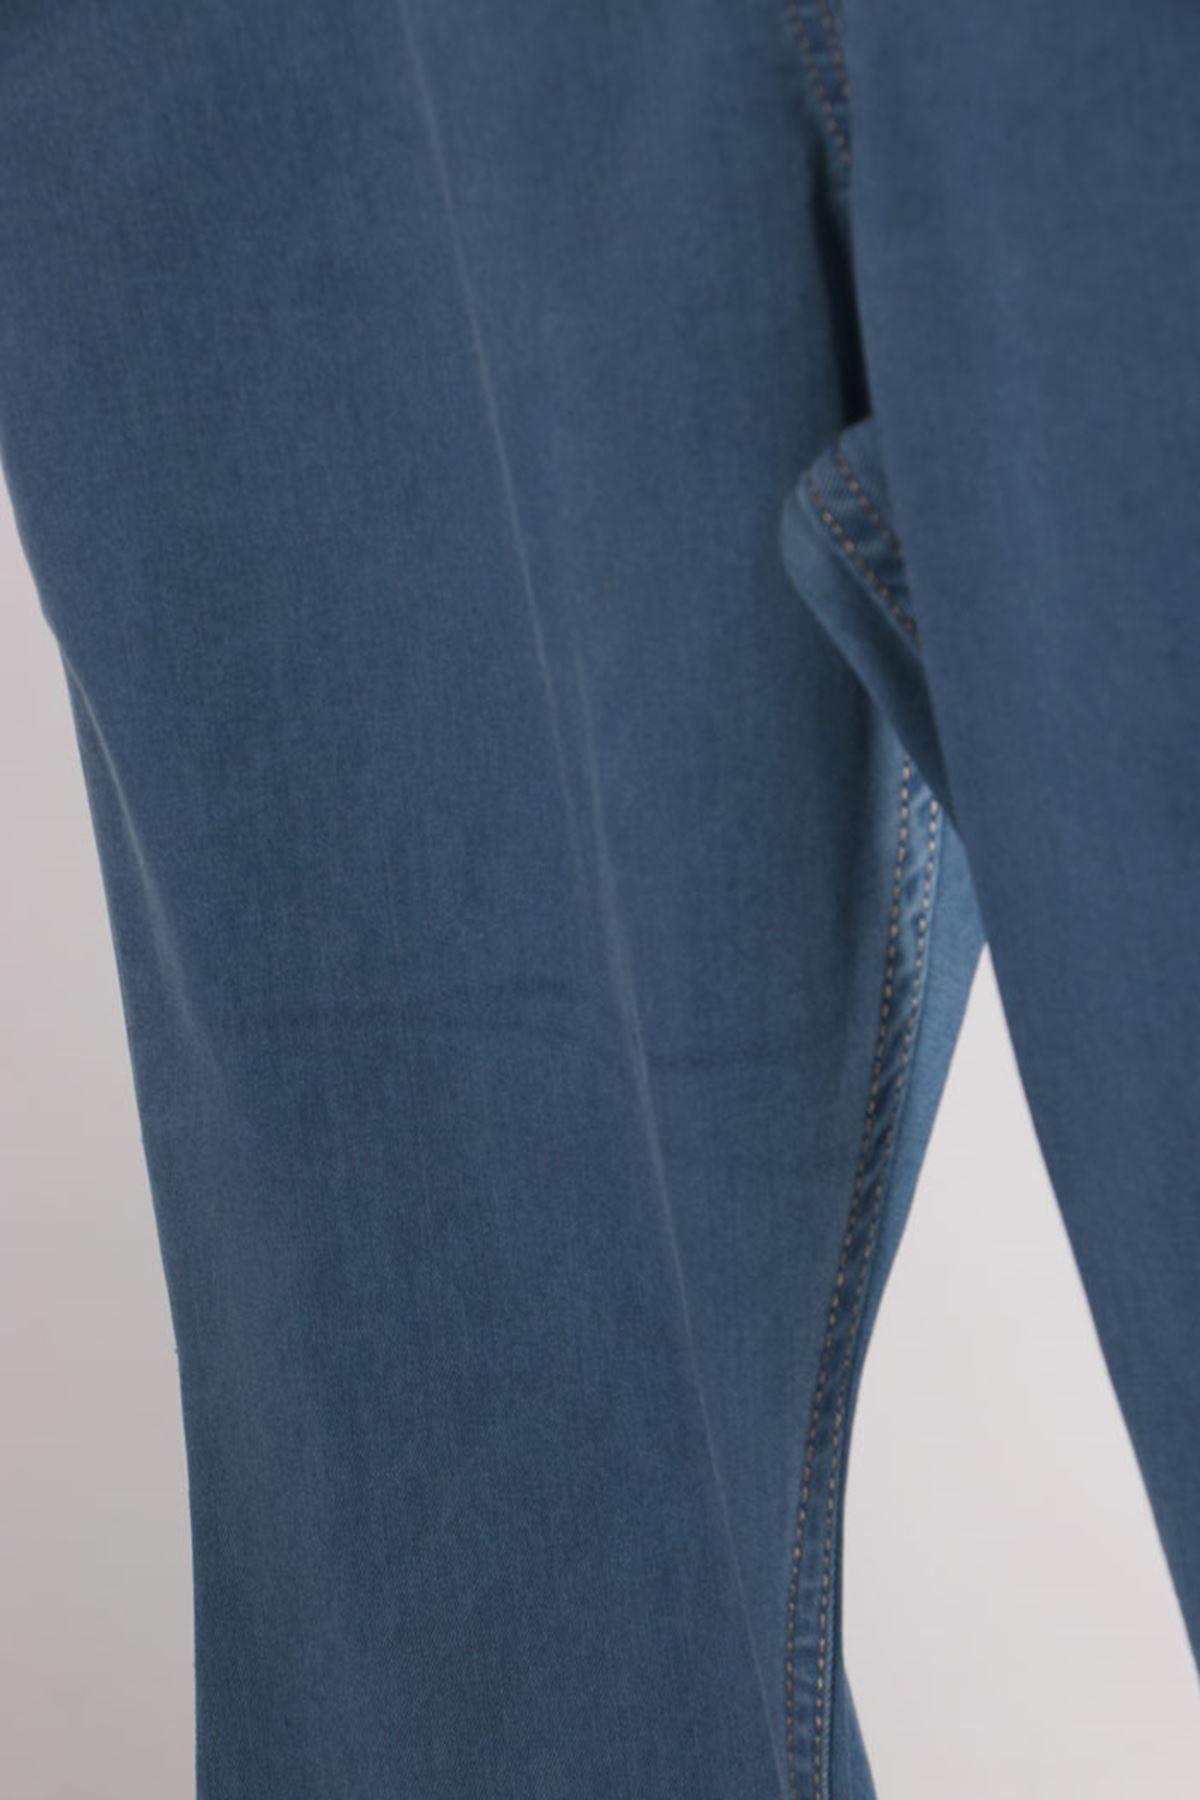 D-9137-2 Büyük Beden Defolu Beli Lastikli İspanyol Paça Kot Pantalon-Bebe Mavi